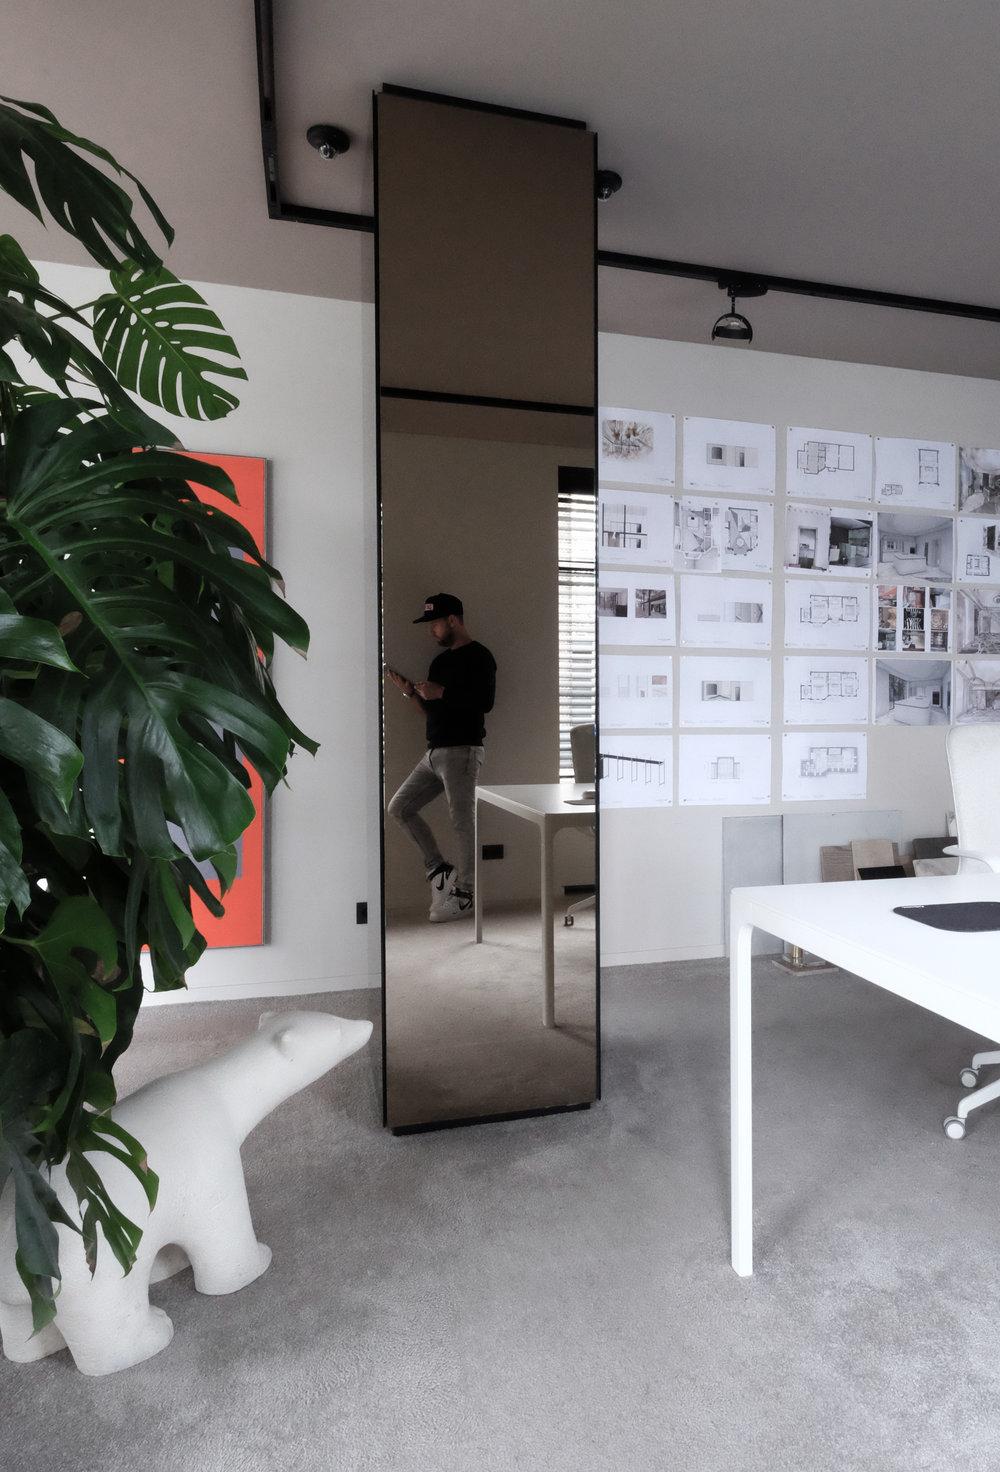 005 studio lex de gooijer interiors Rotterdam.jpg